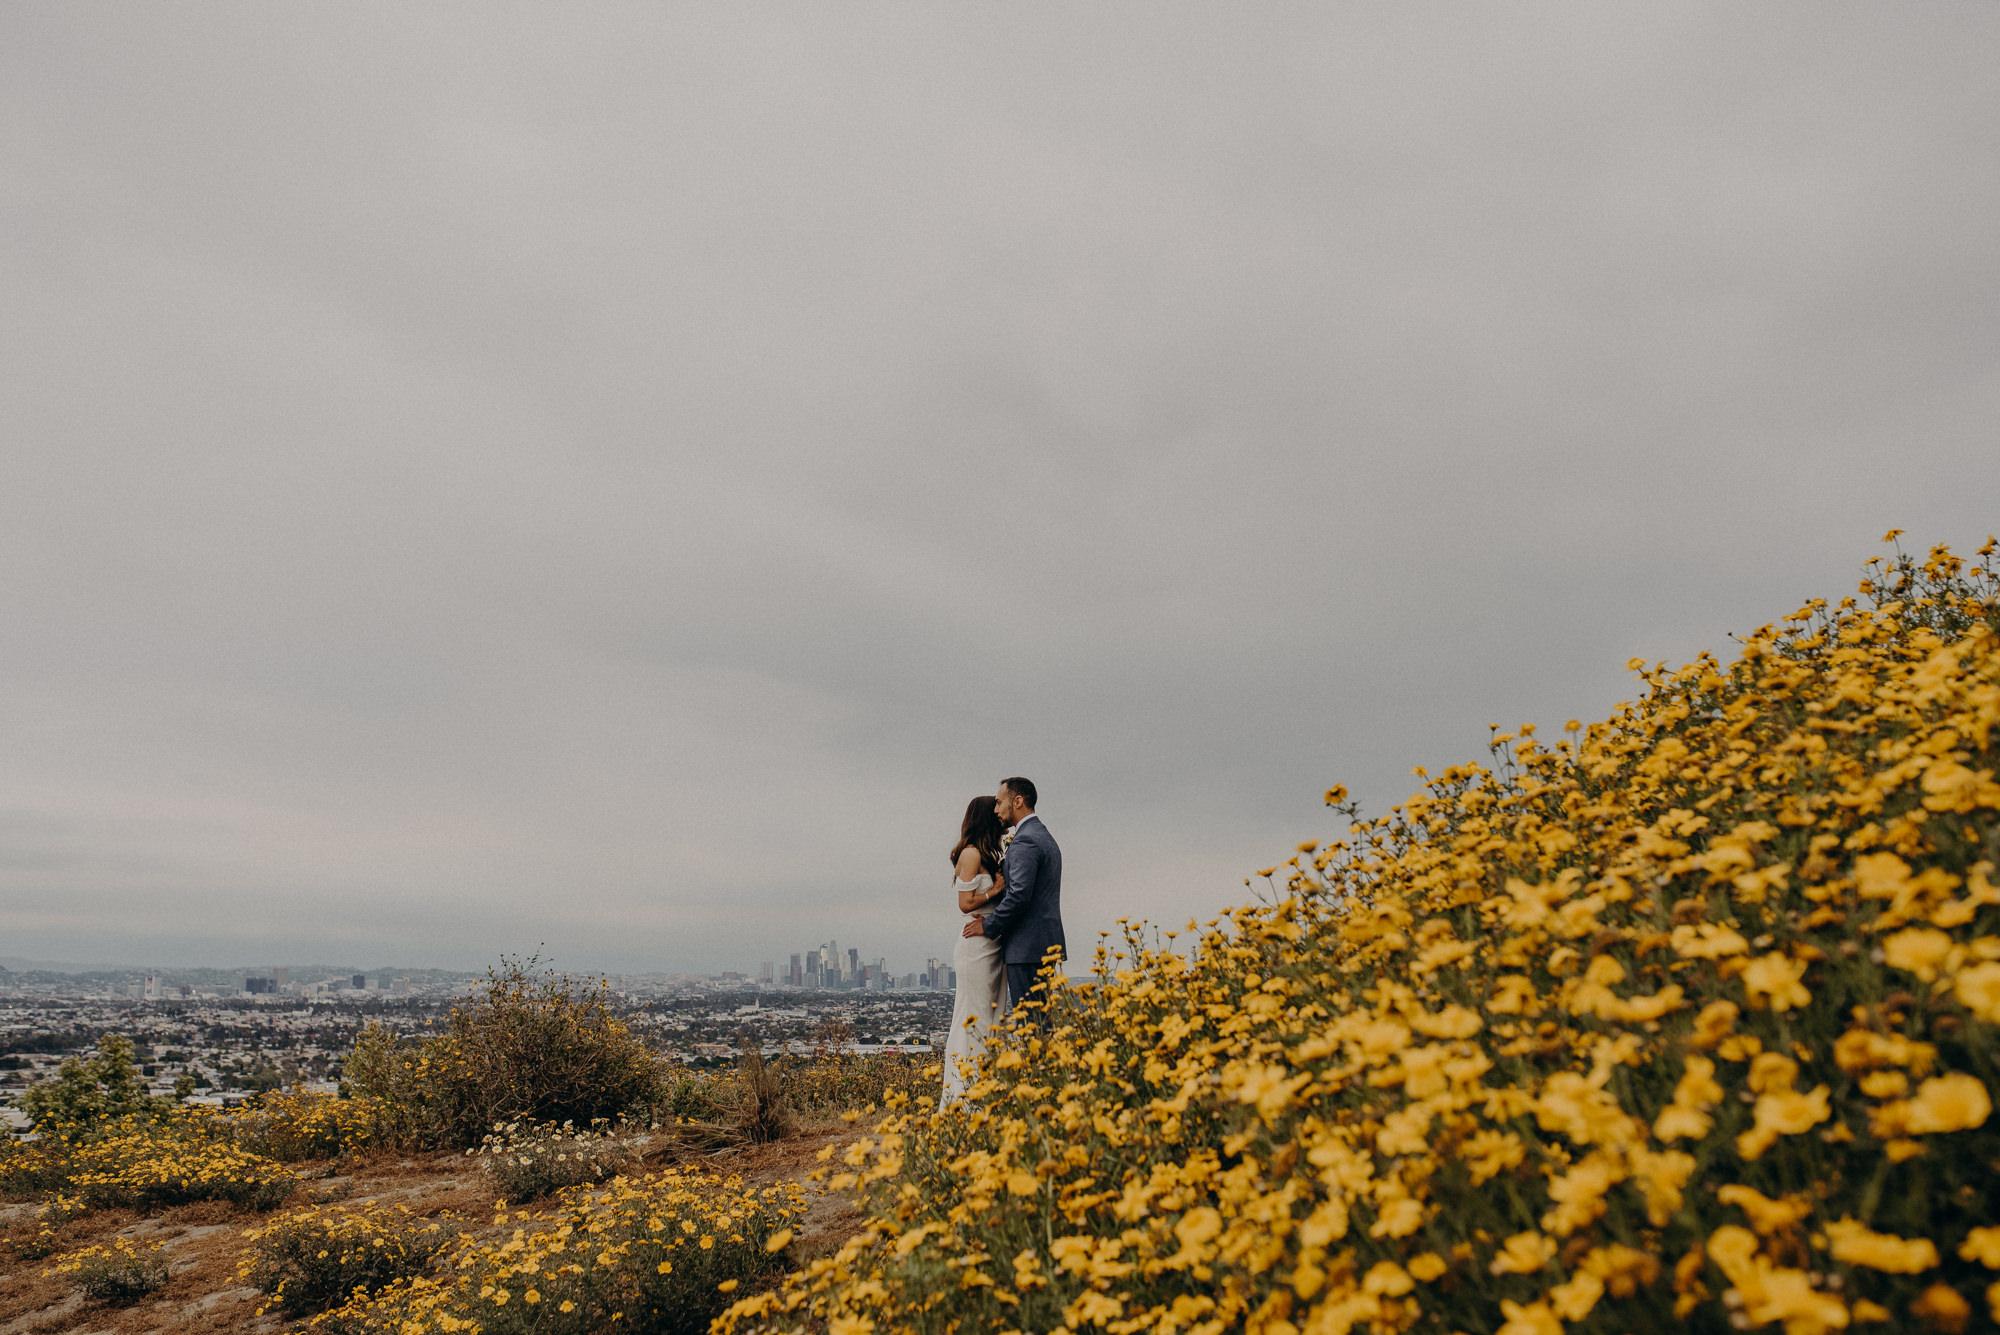 elopement photographer in los angeles - la wedding photographer - isaiahandtaylor.com-052.jpg